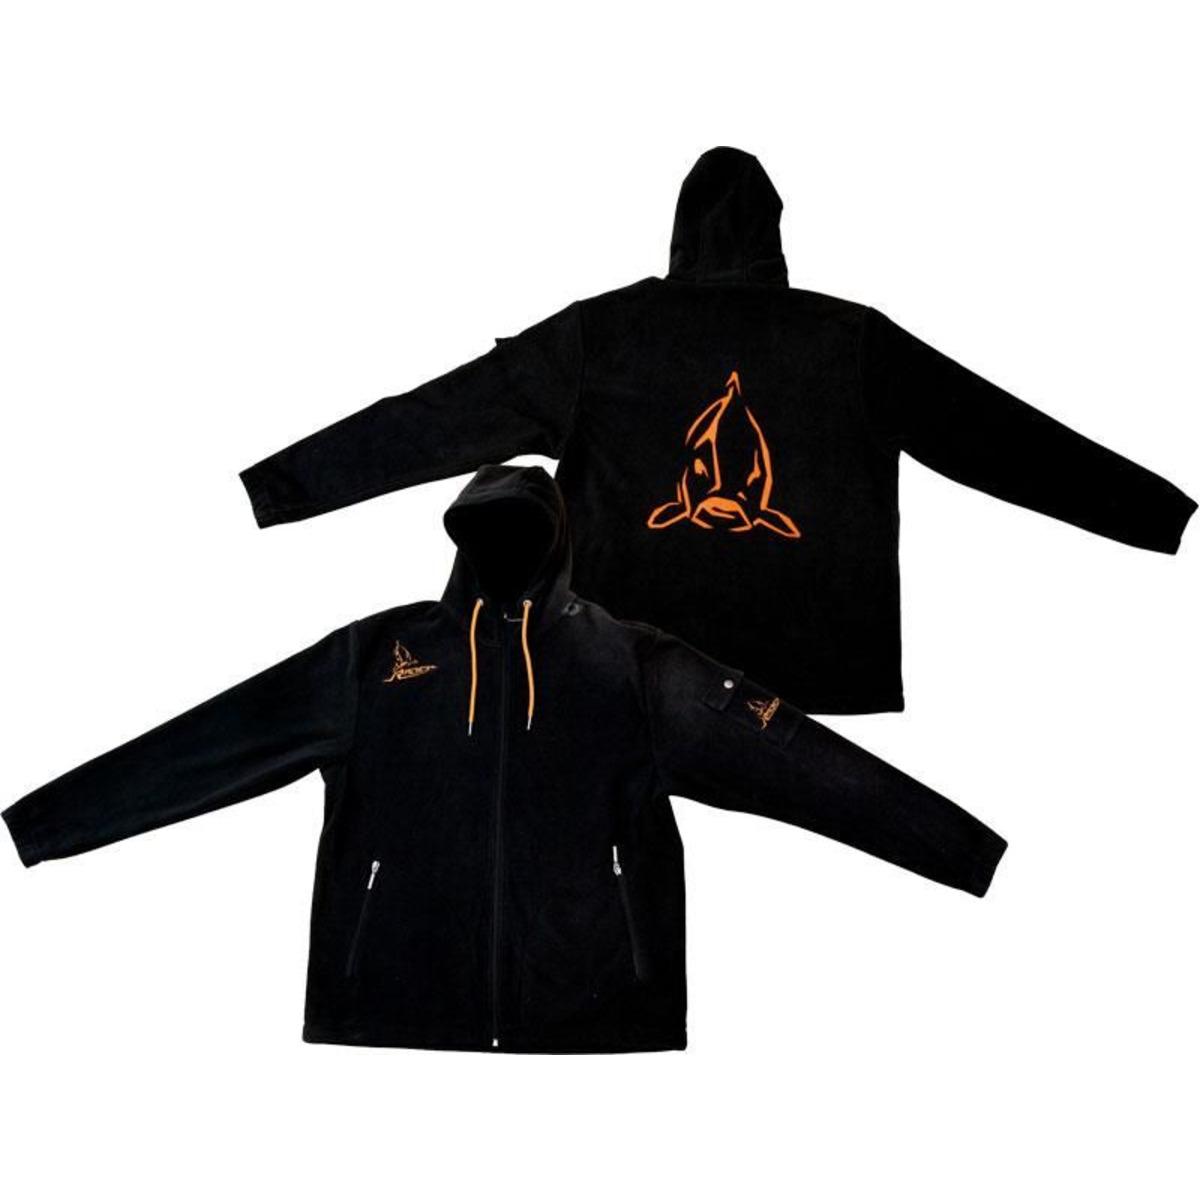 Radical Fleece Jacket - M - Black